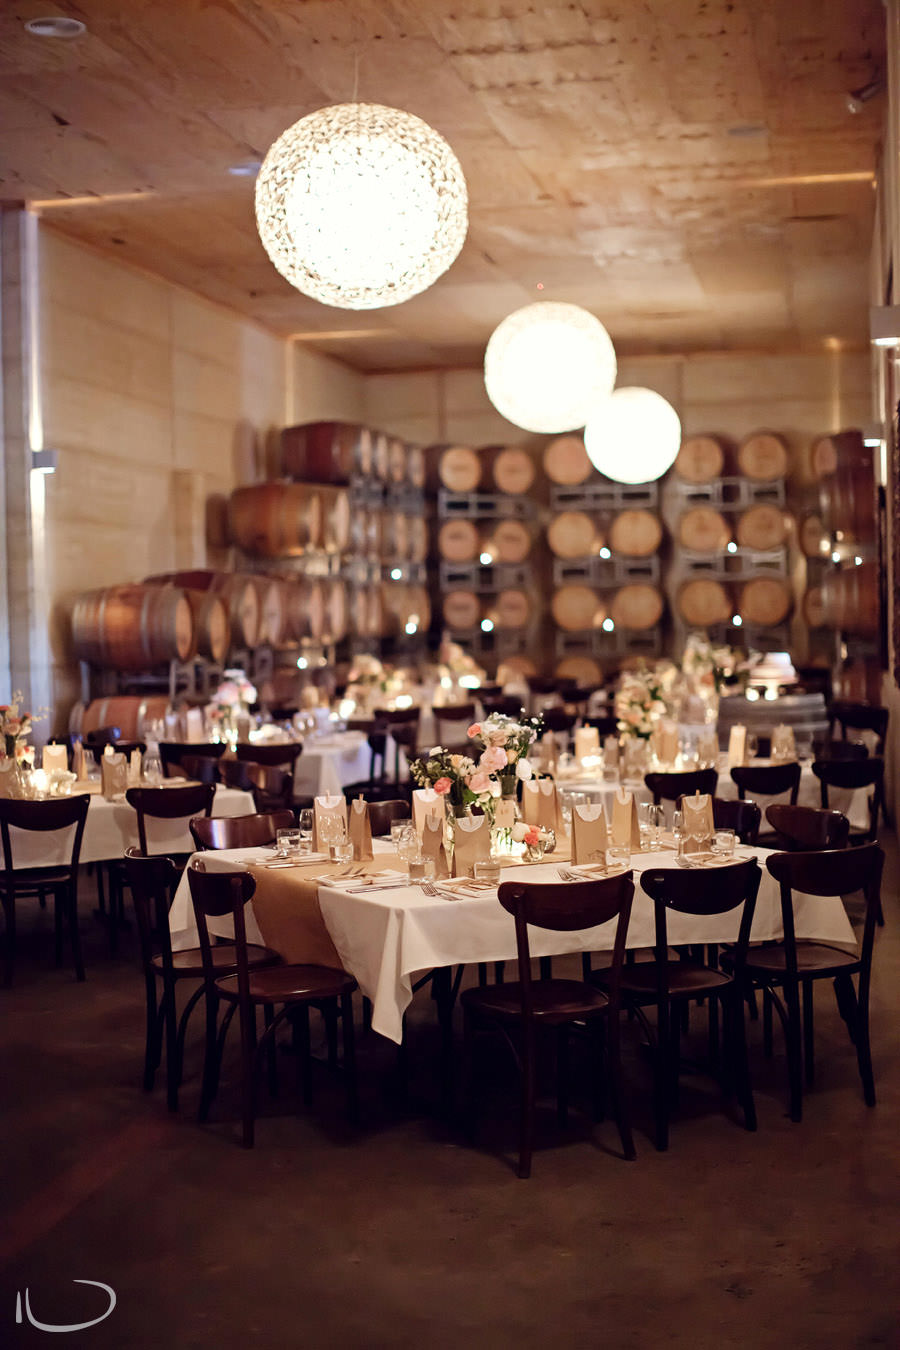 Margan Winery Hunter Valley Wedding Photographer: Wedding reception wine barrel room setup